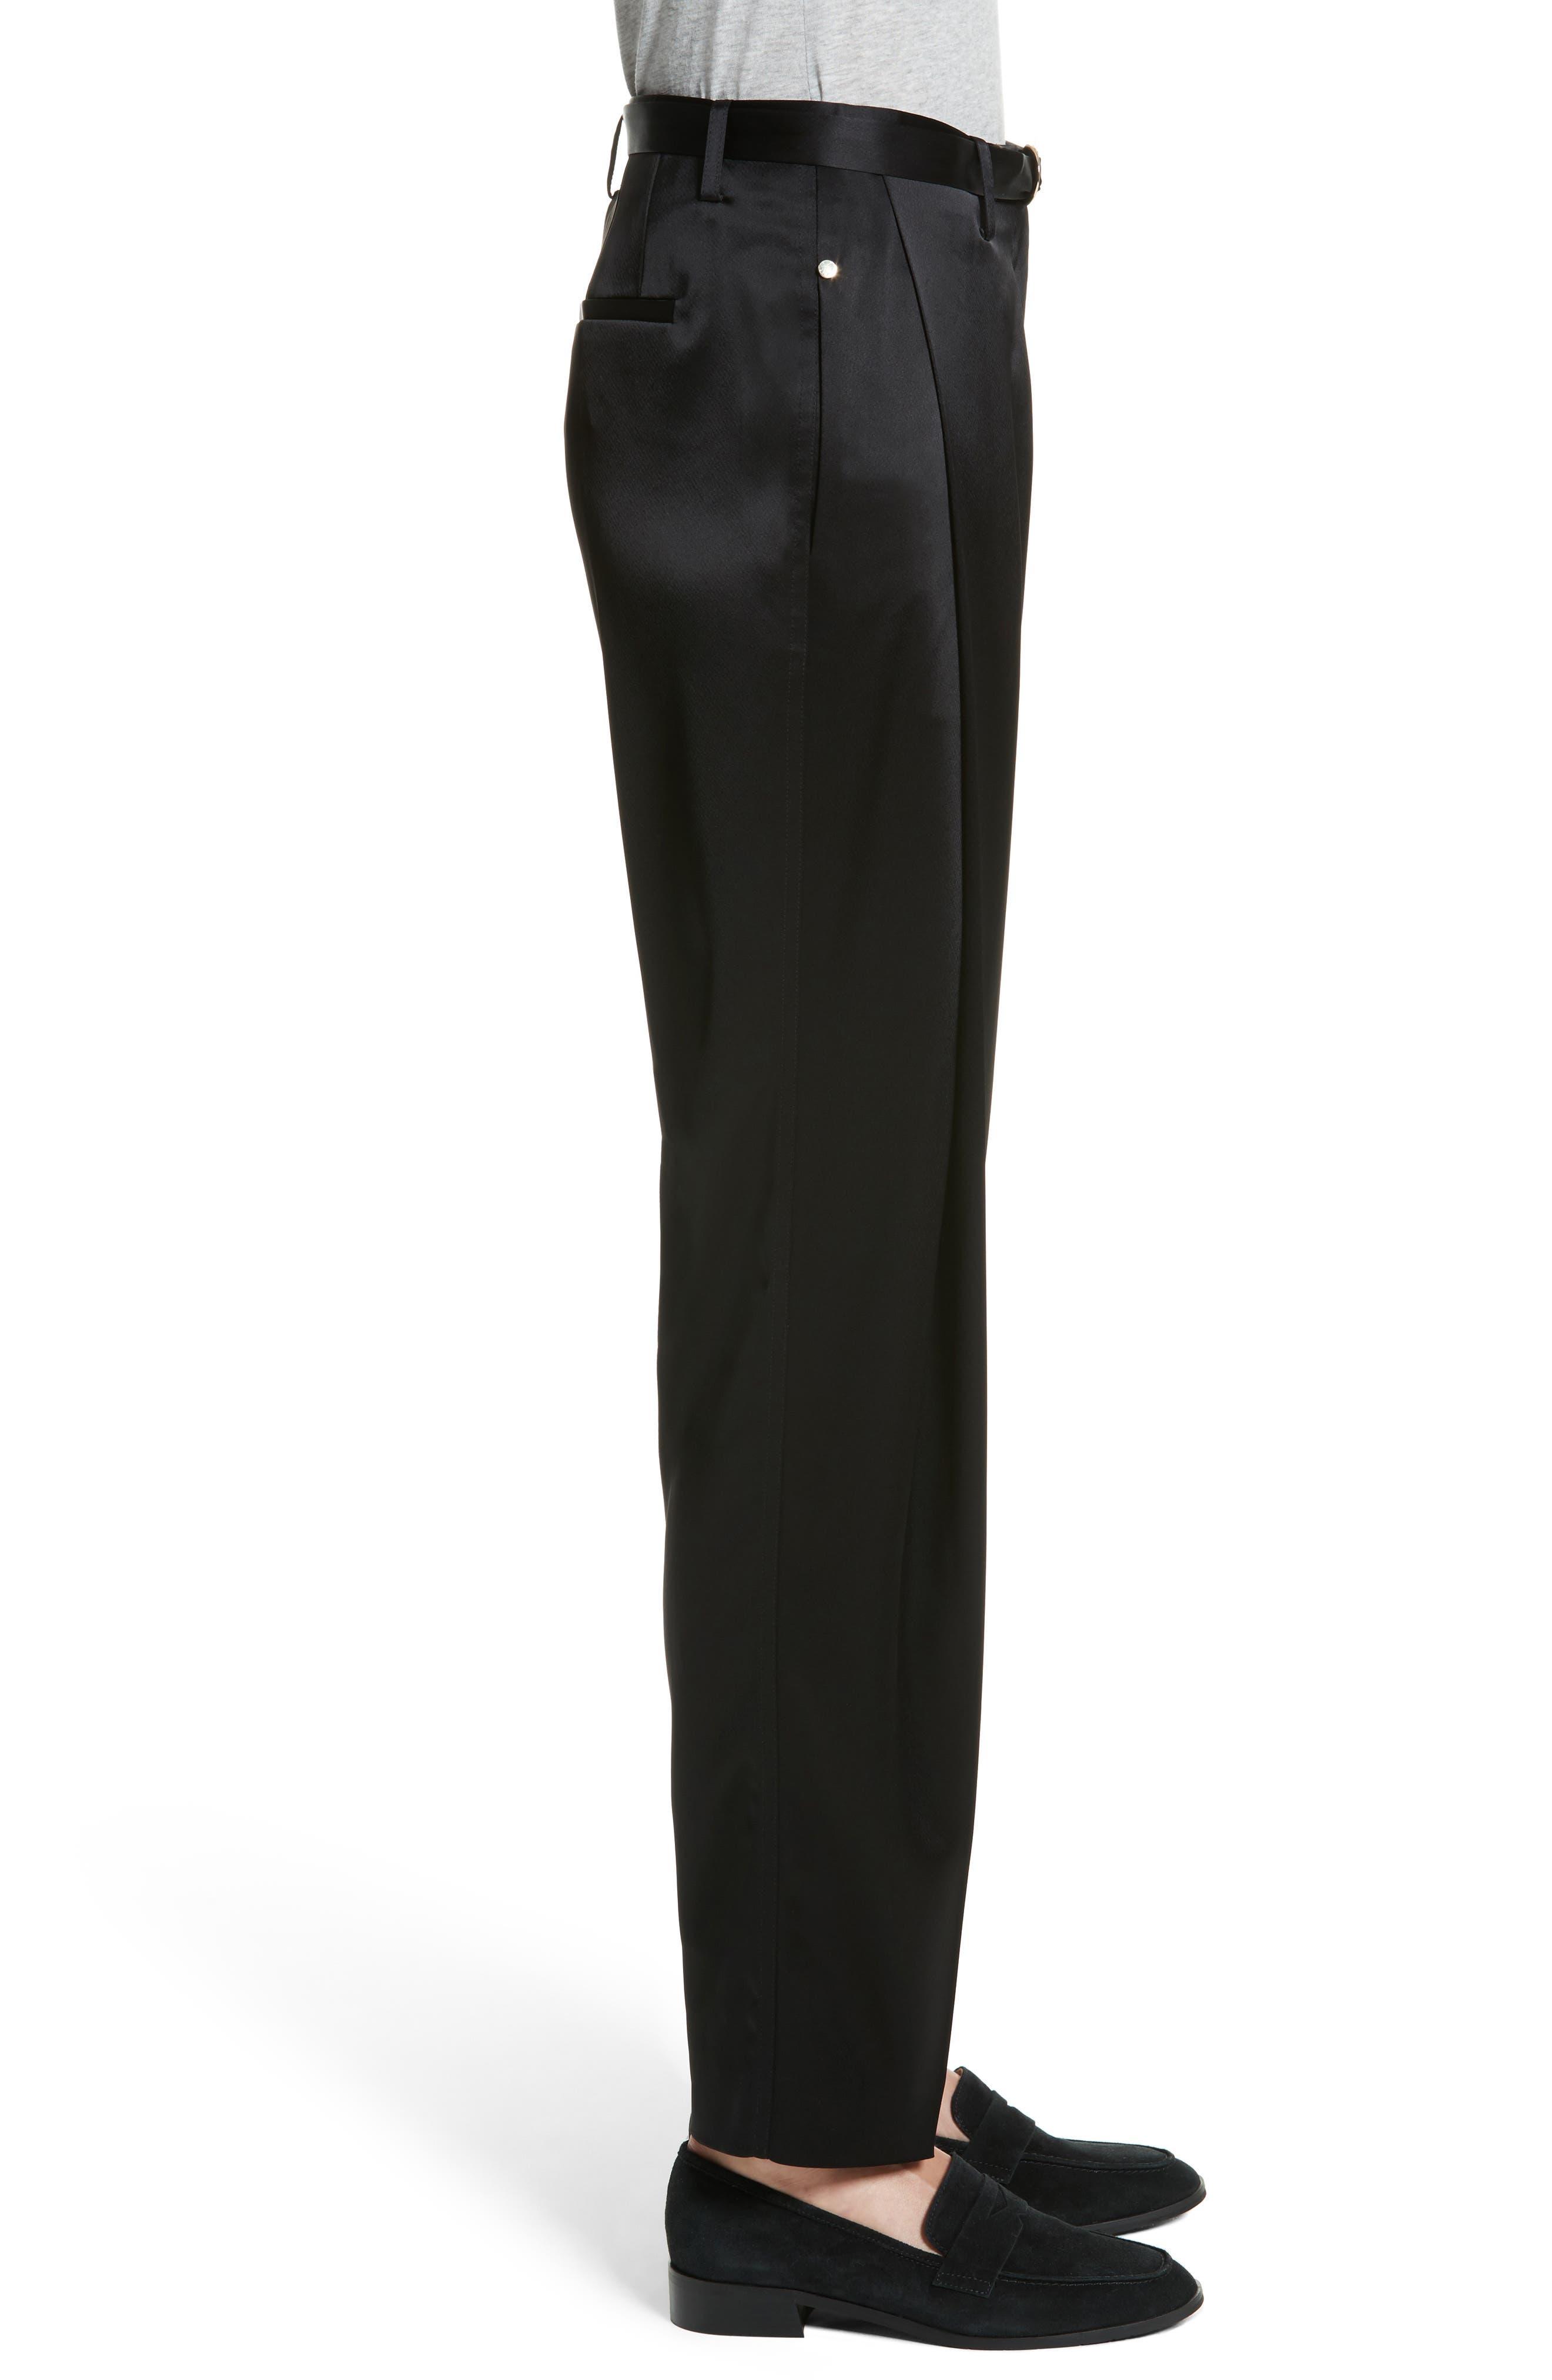 Nassau Reverie Satin Cloth Pants,                             Alternate thumbnail 3, color,